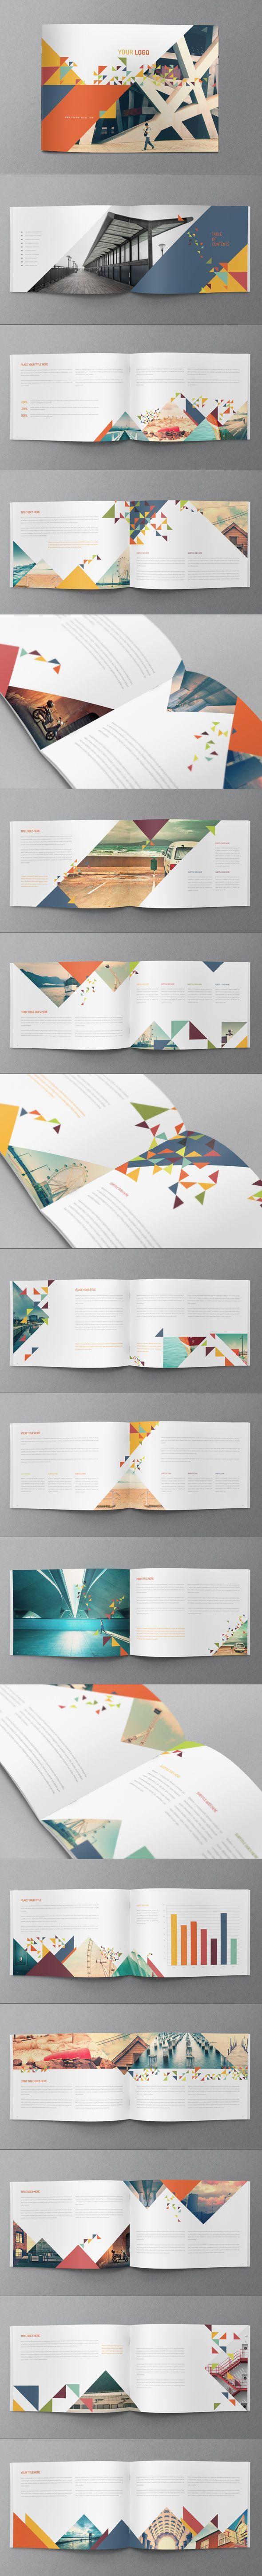 Modern Brochure Design  Branding  Identity